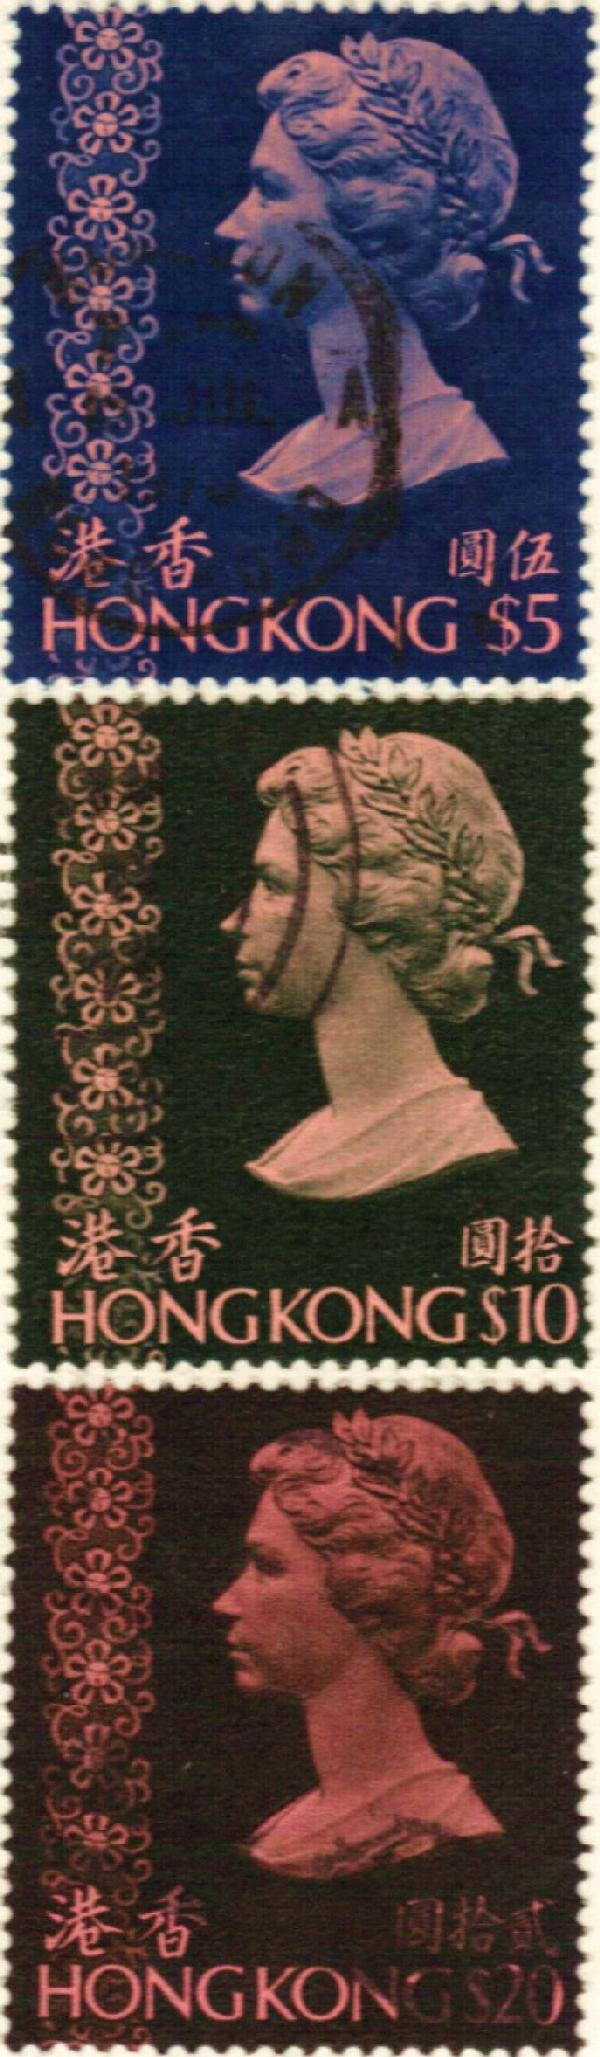 1973 Hong Kong